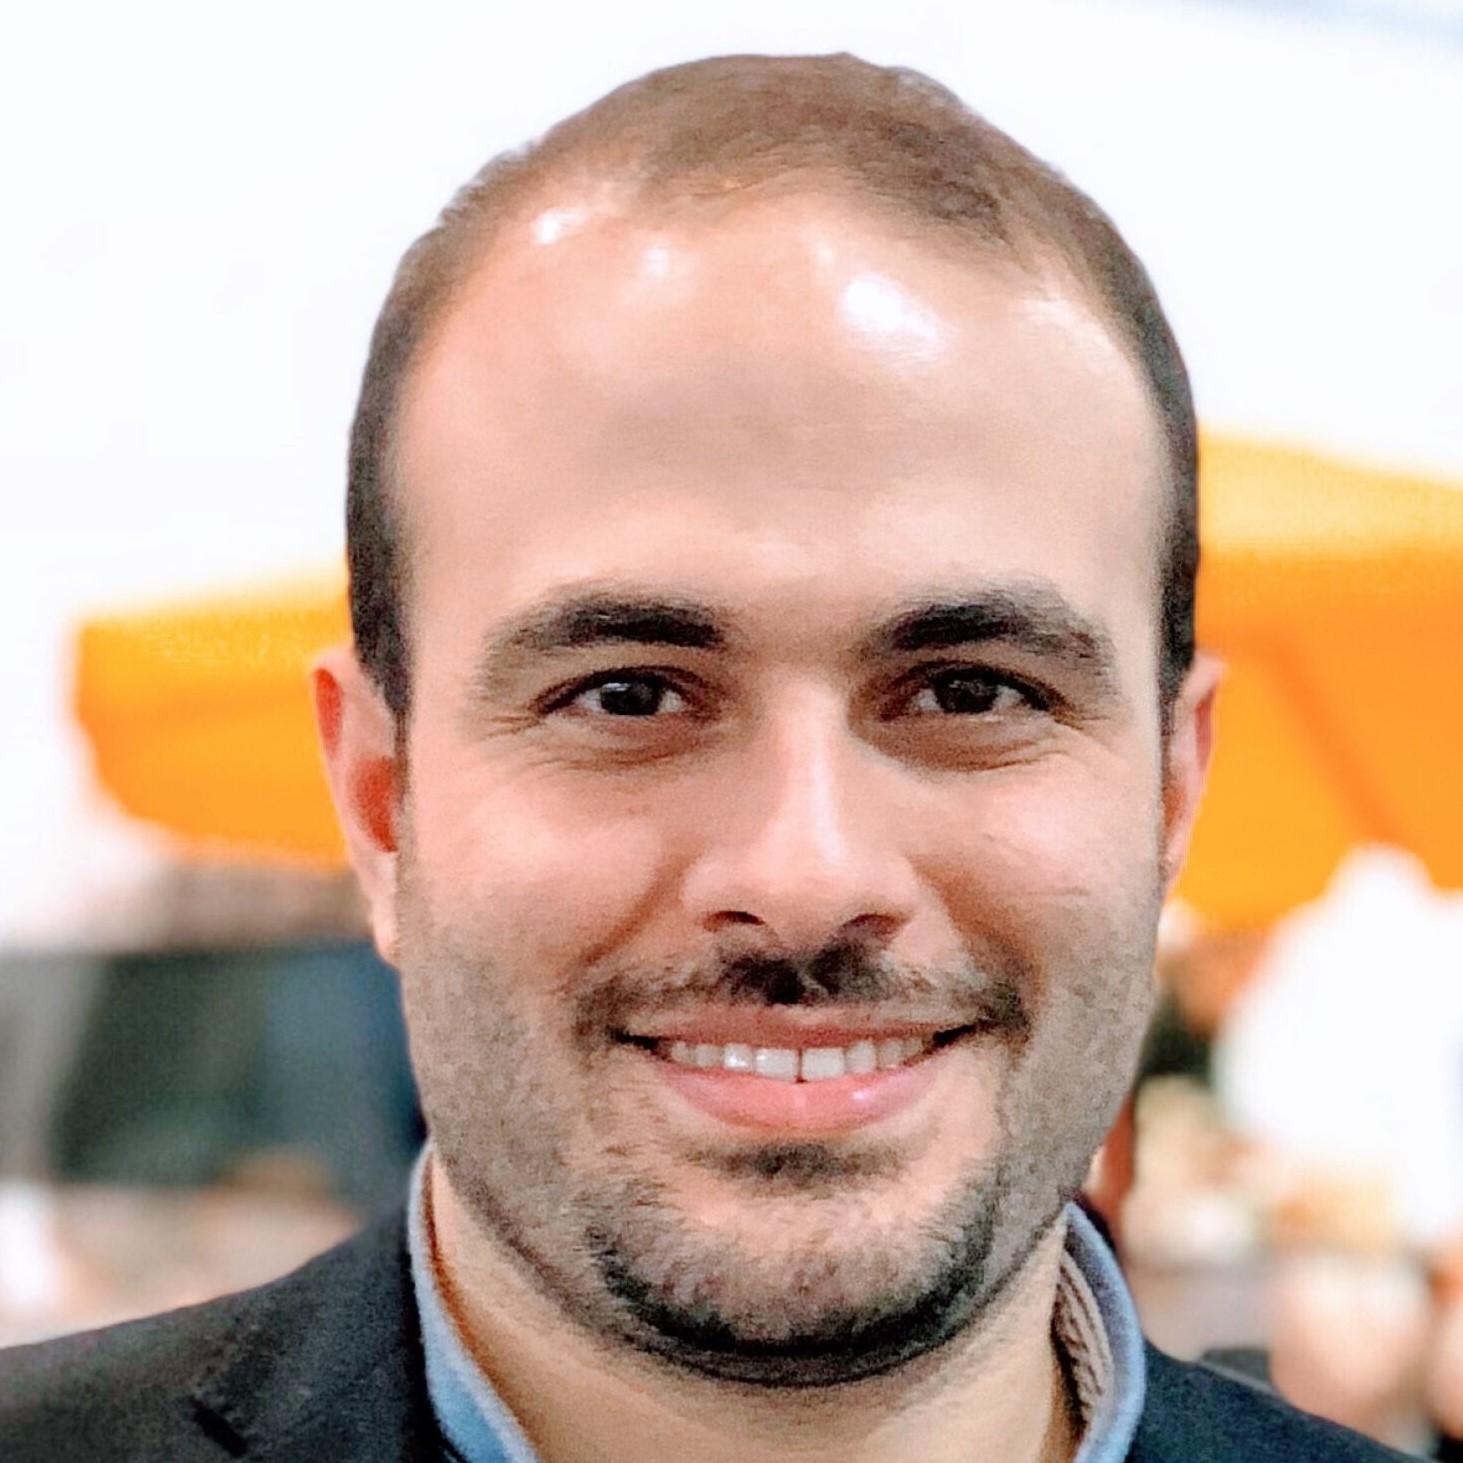 Omar Alassil